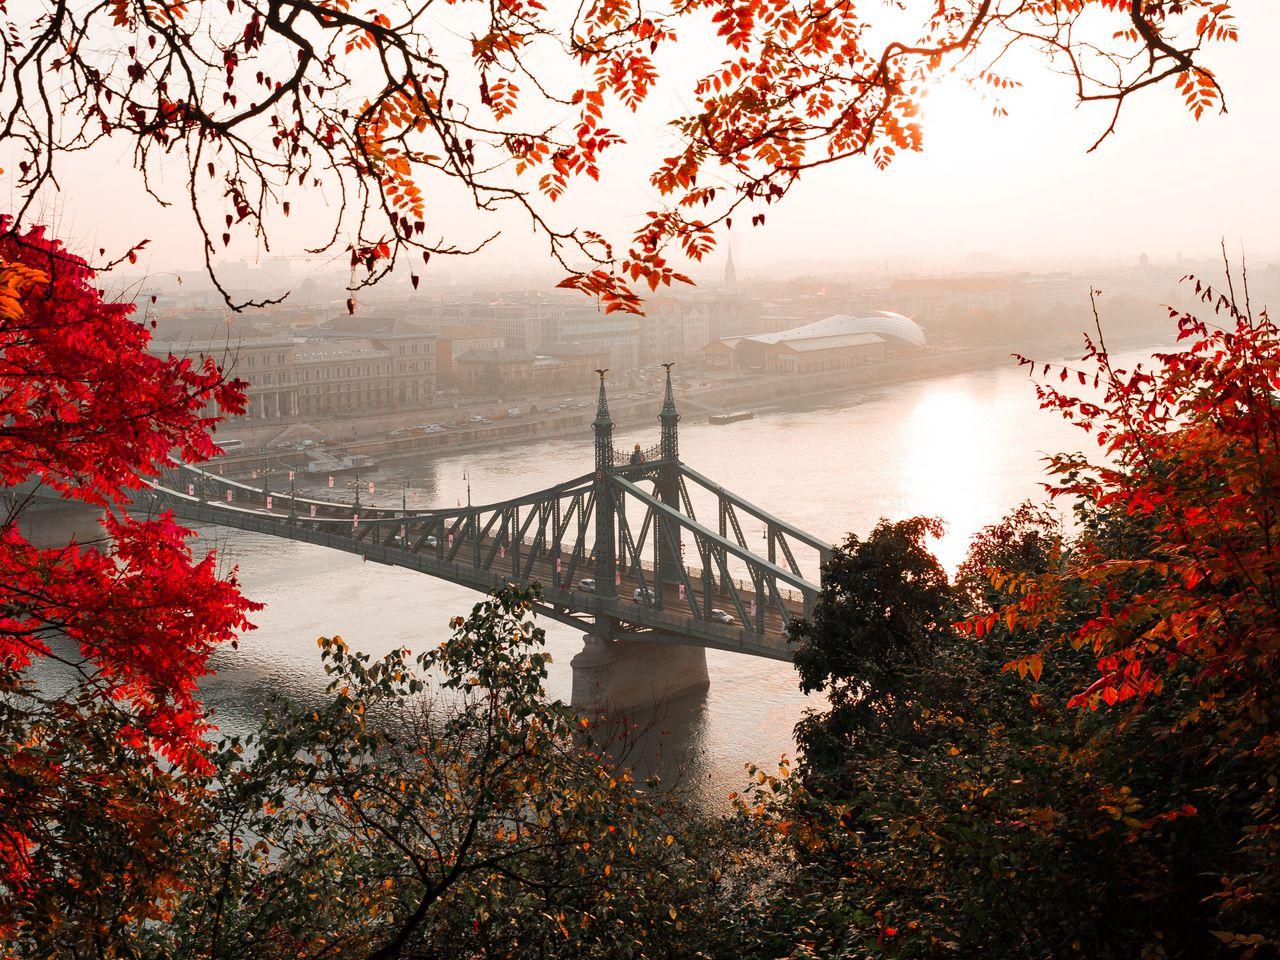 1280x960 Wallpaper bridge, autumn, city, citadella, budapest, hungary